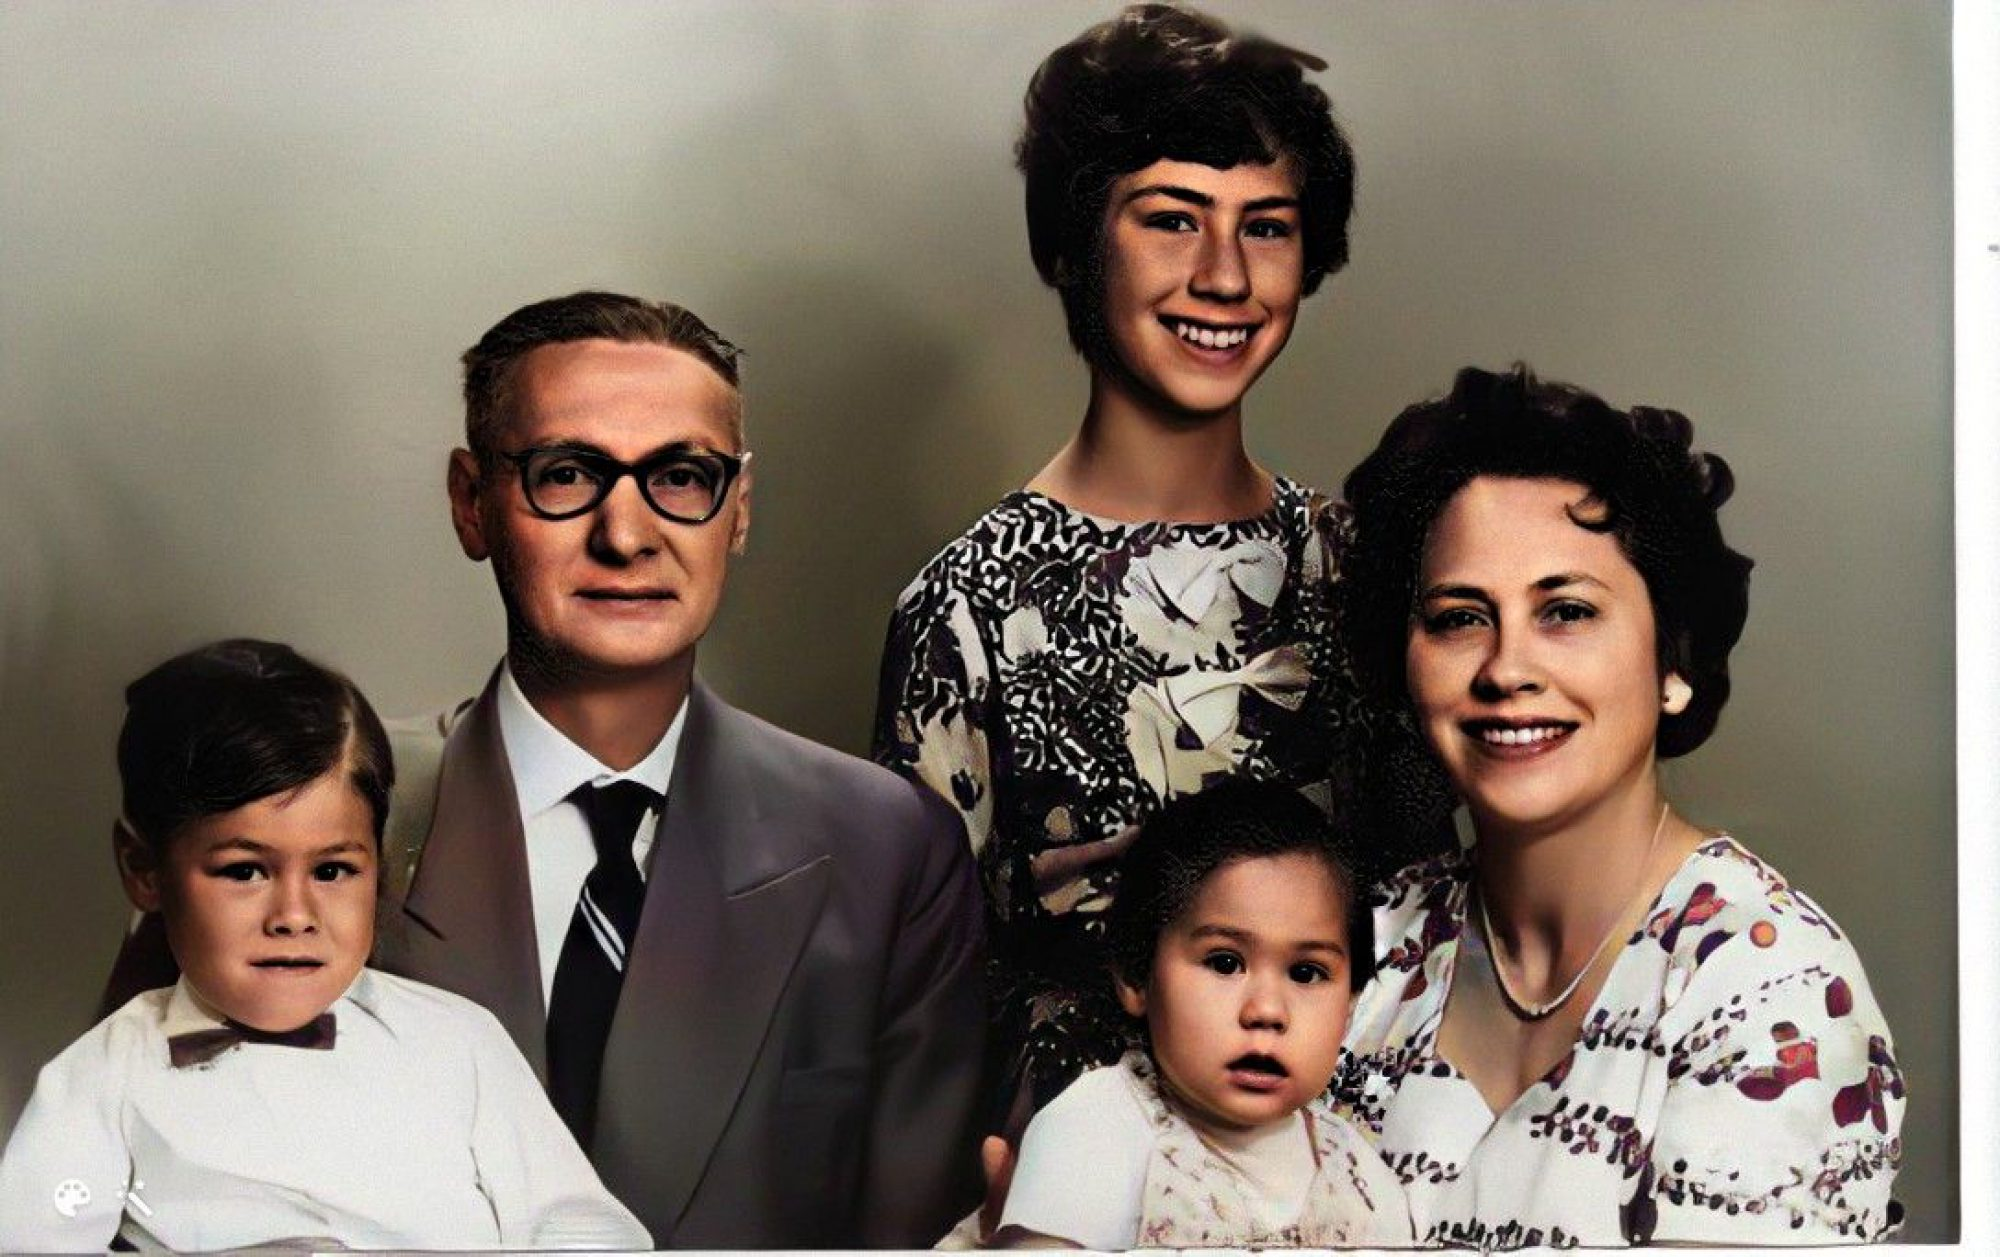 MY RUSCHE FAMILY